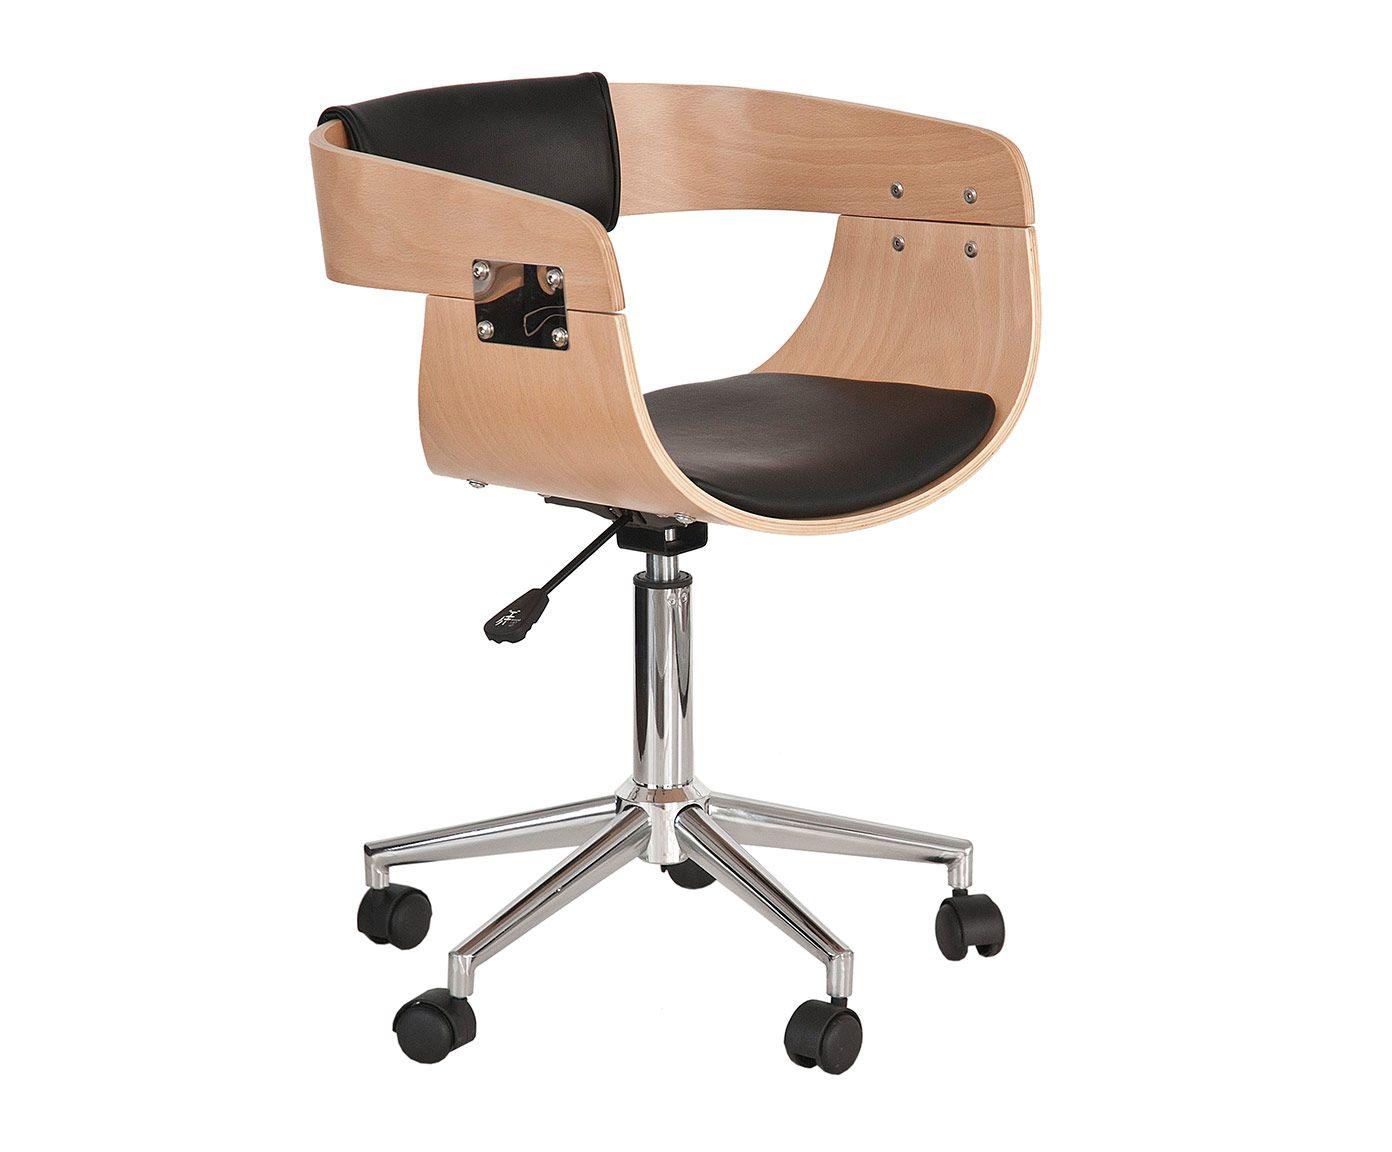 Silla de oficina con ruedas natural y negro westwing home living dise o design - Westwing sillas ...